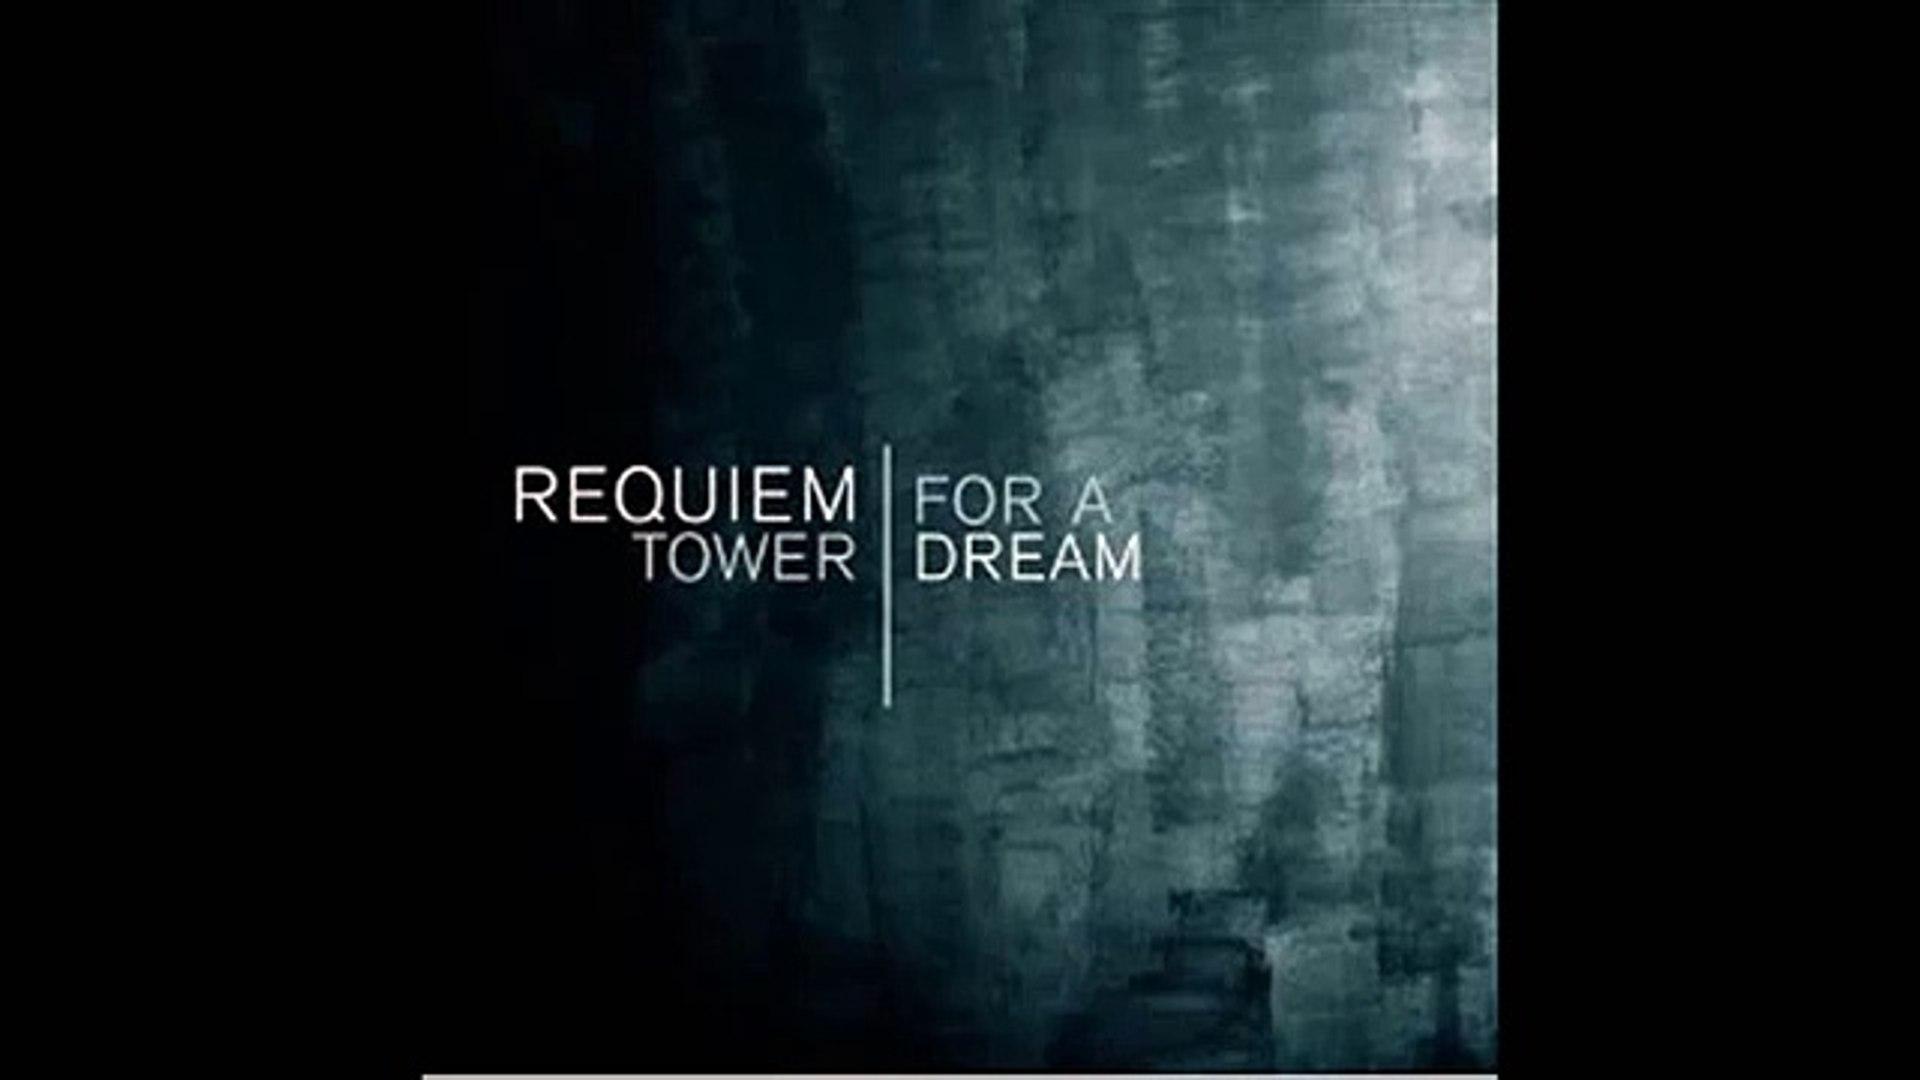 The London Ensemble Requiem For A Dream Lux Aeterna Video